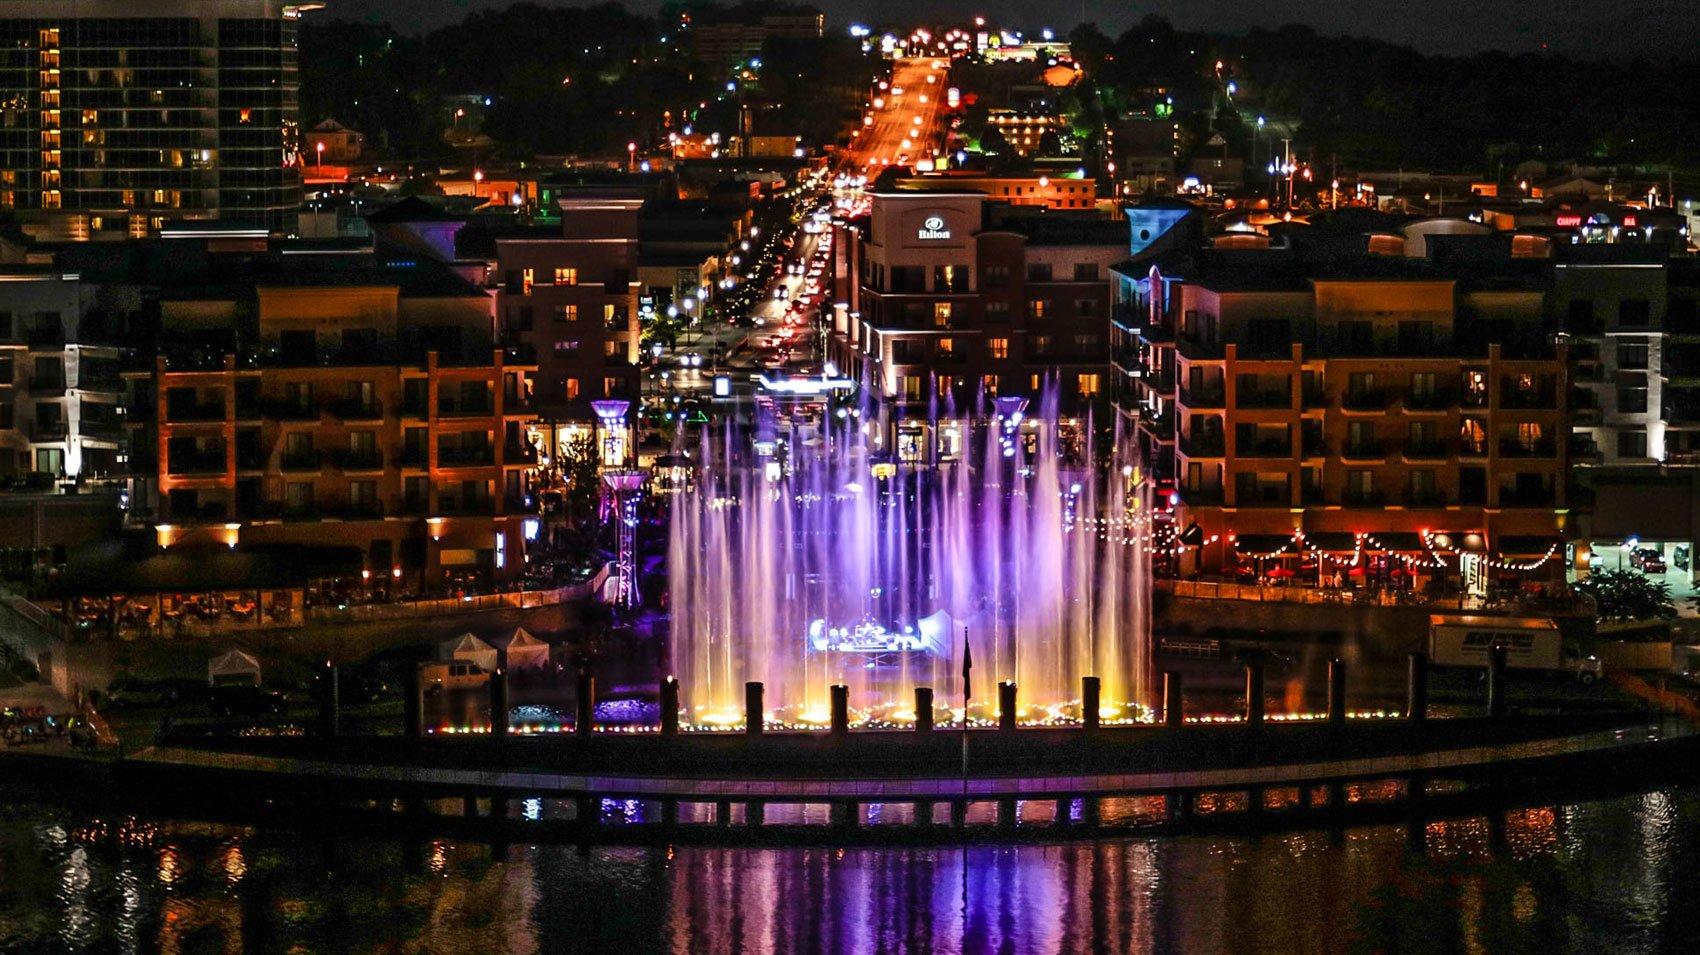 The Branson Landing - Night Fountain